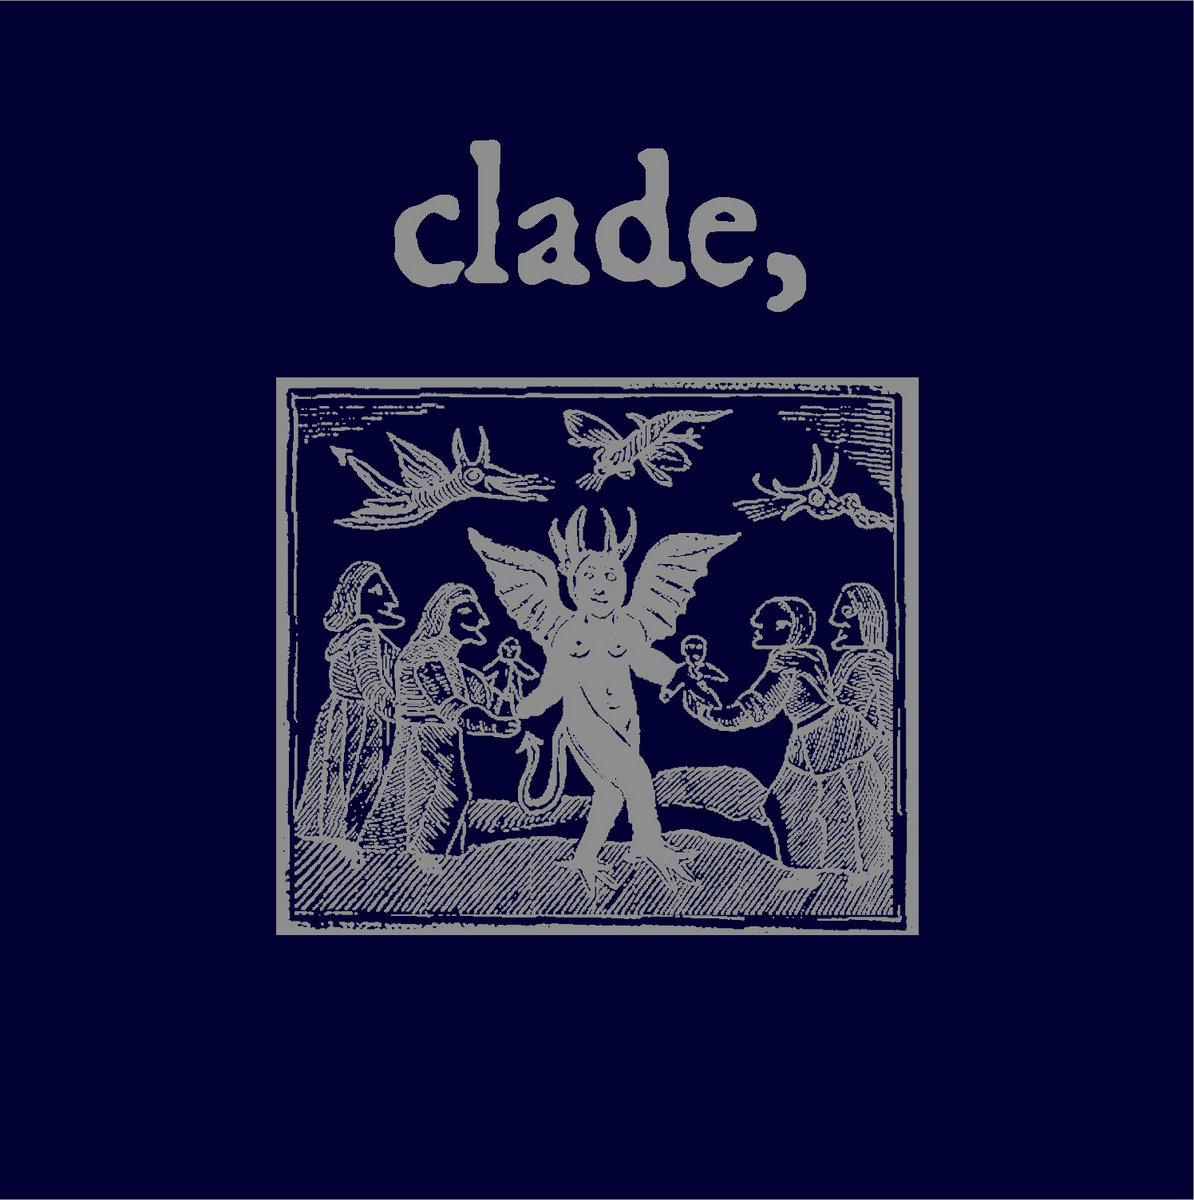 Clade - Holonic Sadism